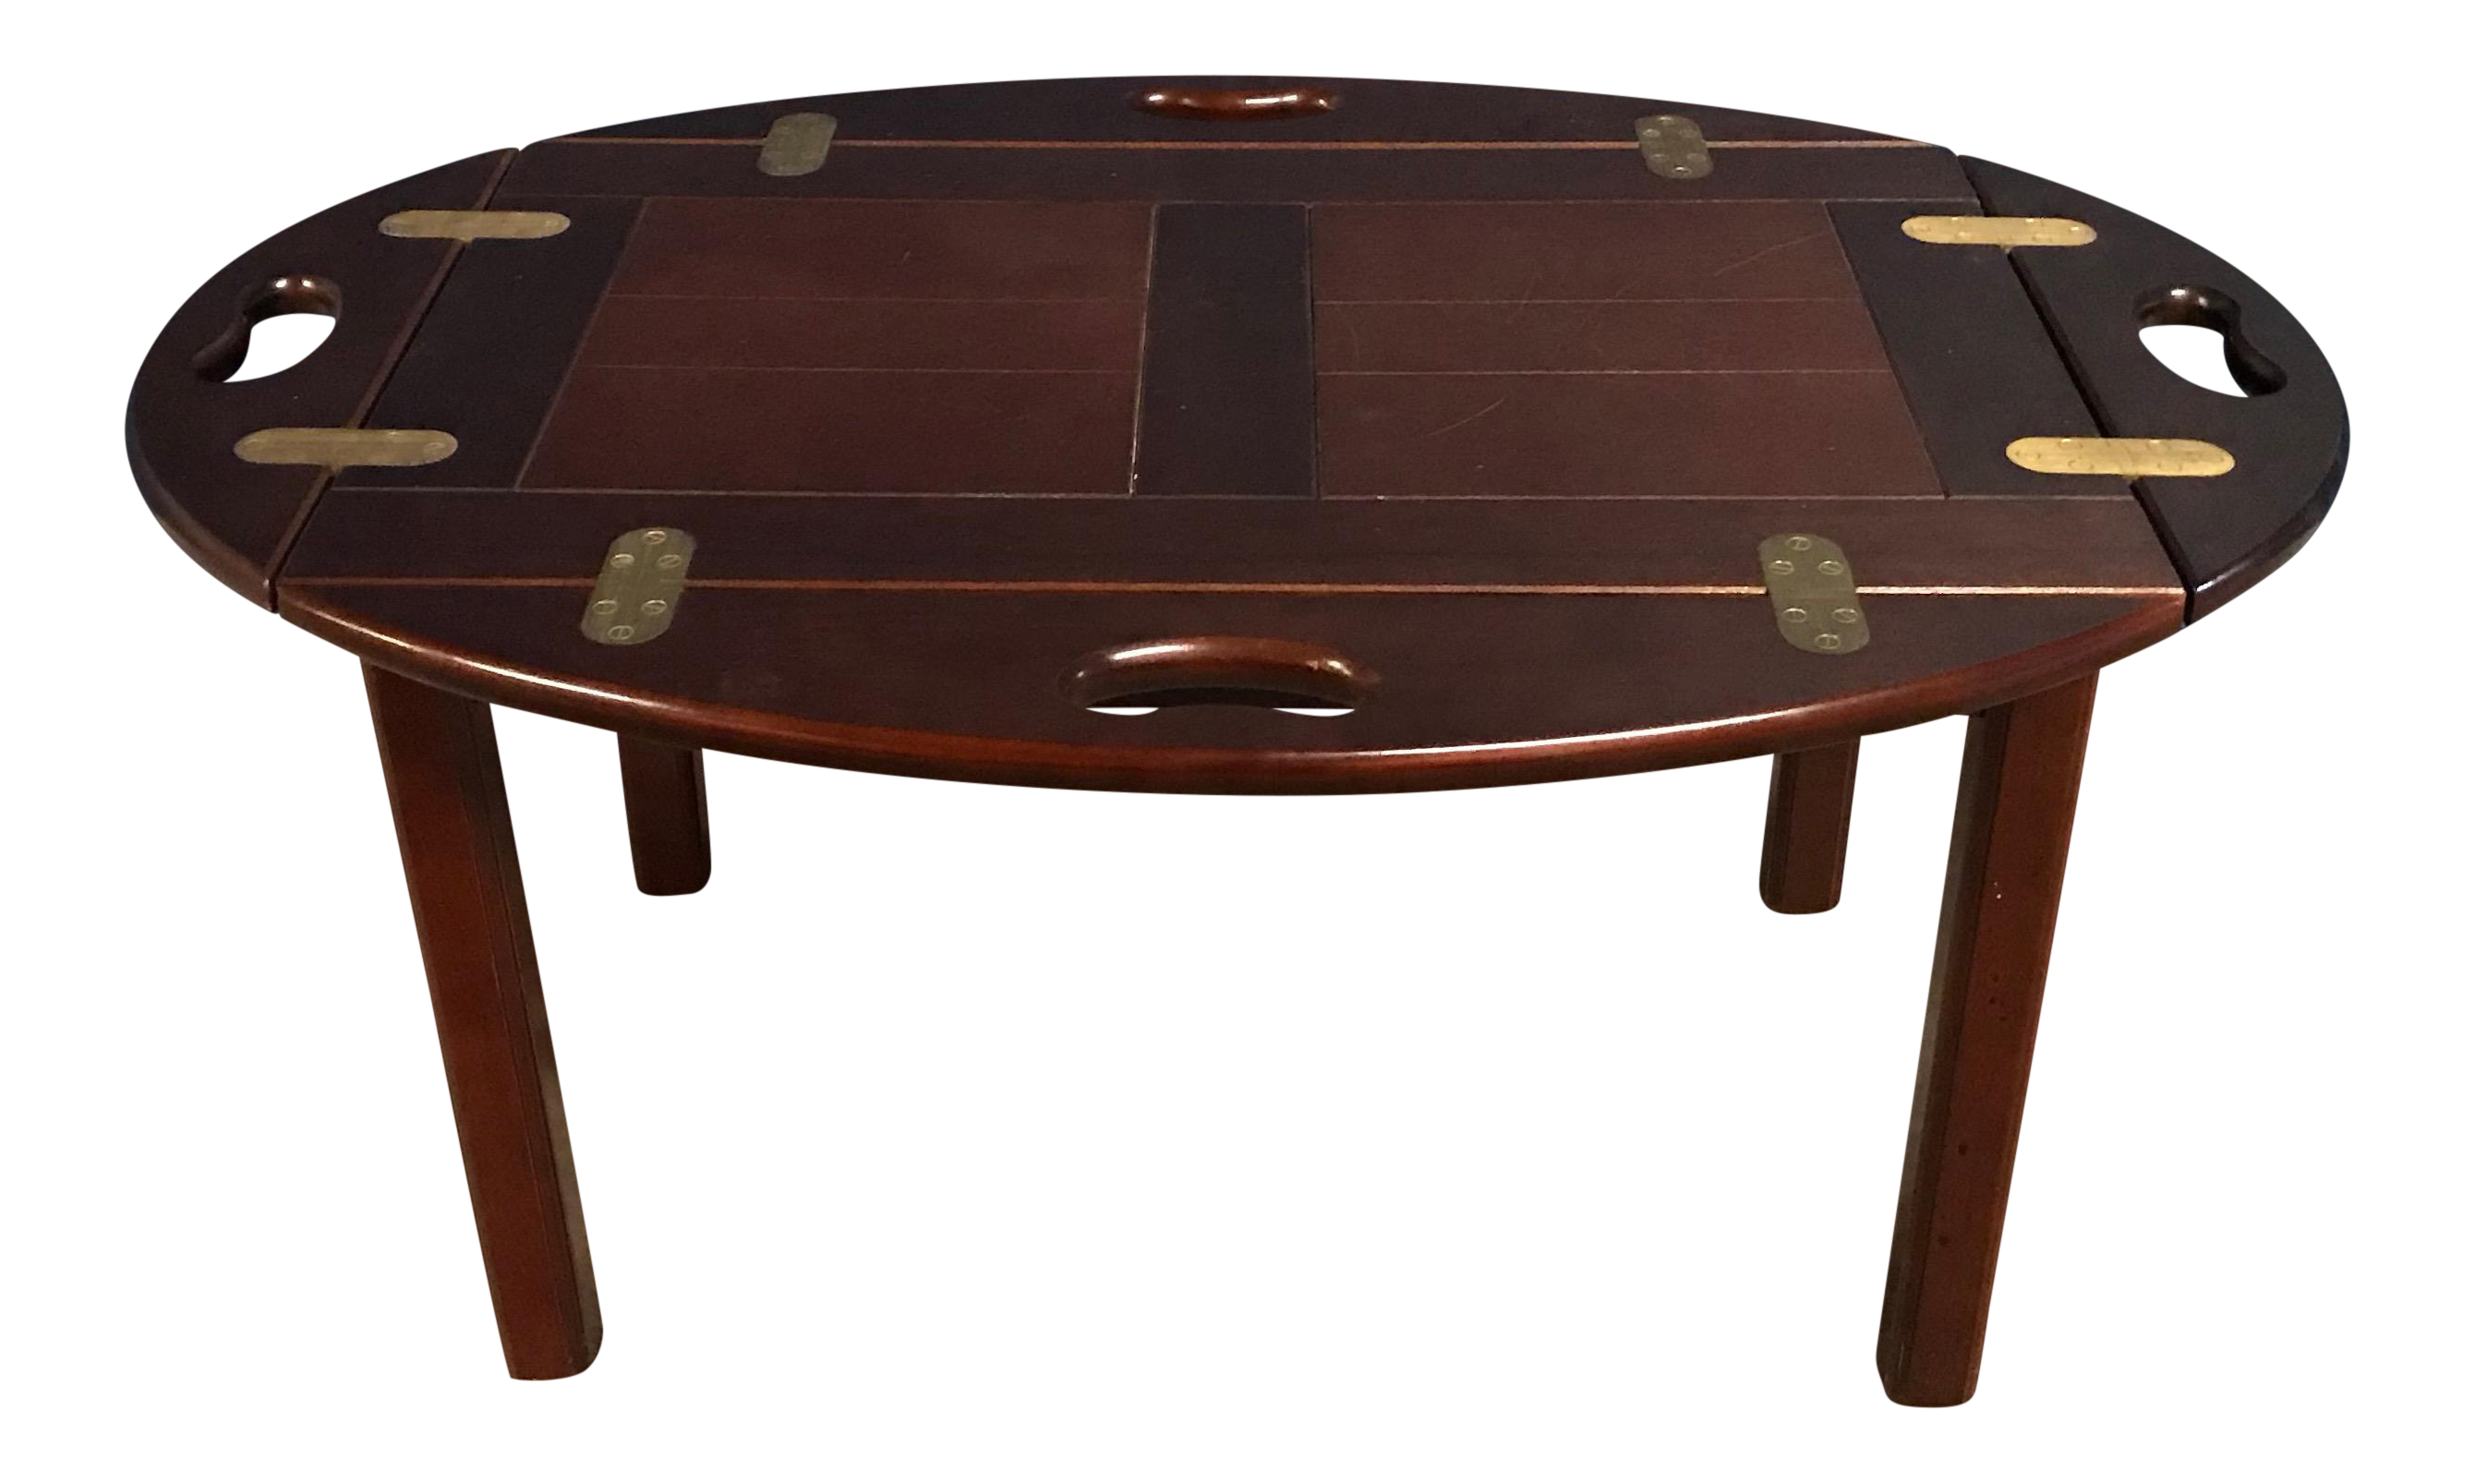 20th Century Contemporary Dark Wood Bombay Butler Tray Coffee Table Chairish